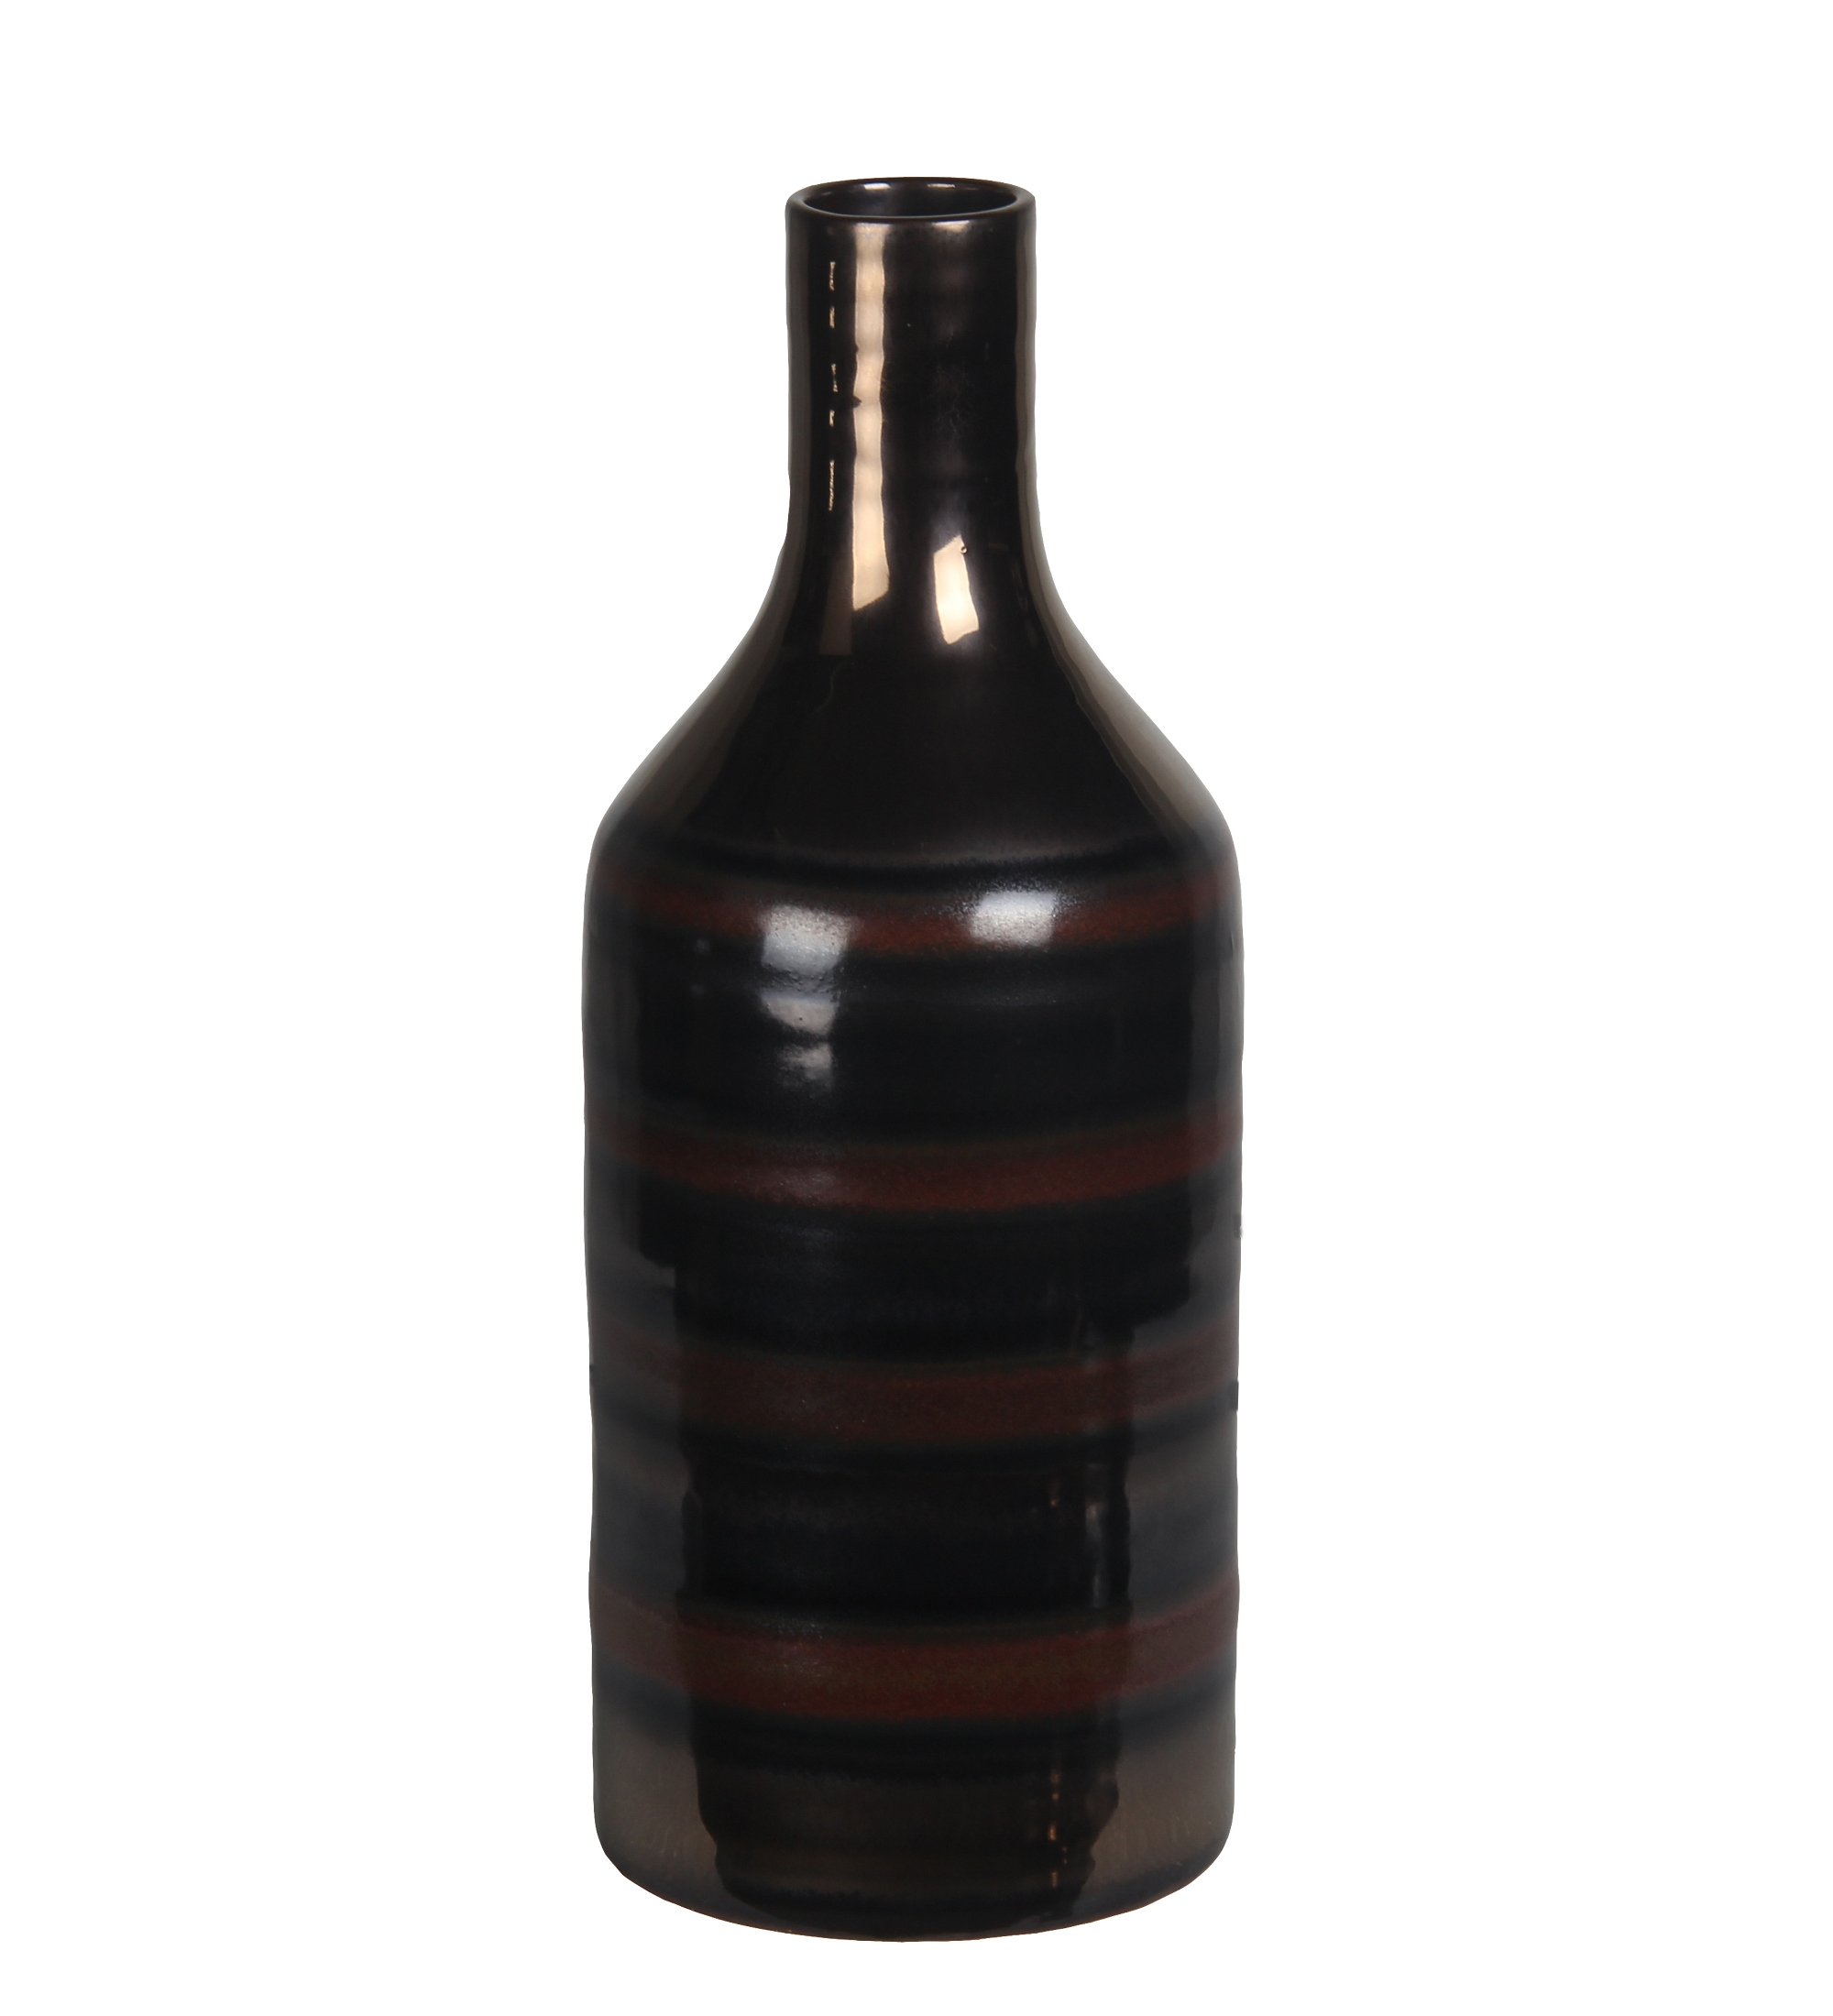 Privilege Contemporary Ceramic vase With Brown Finish 78215